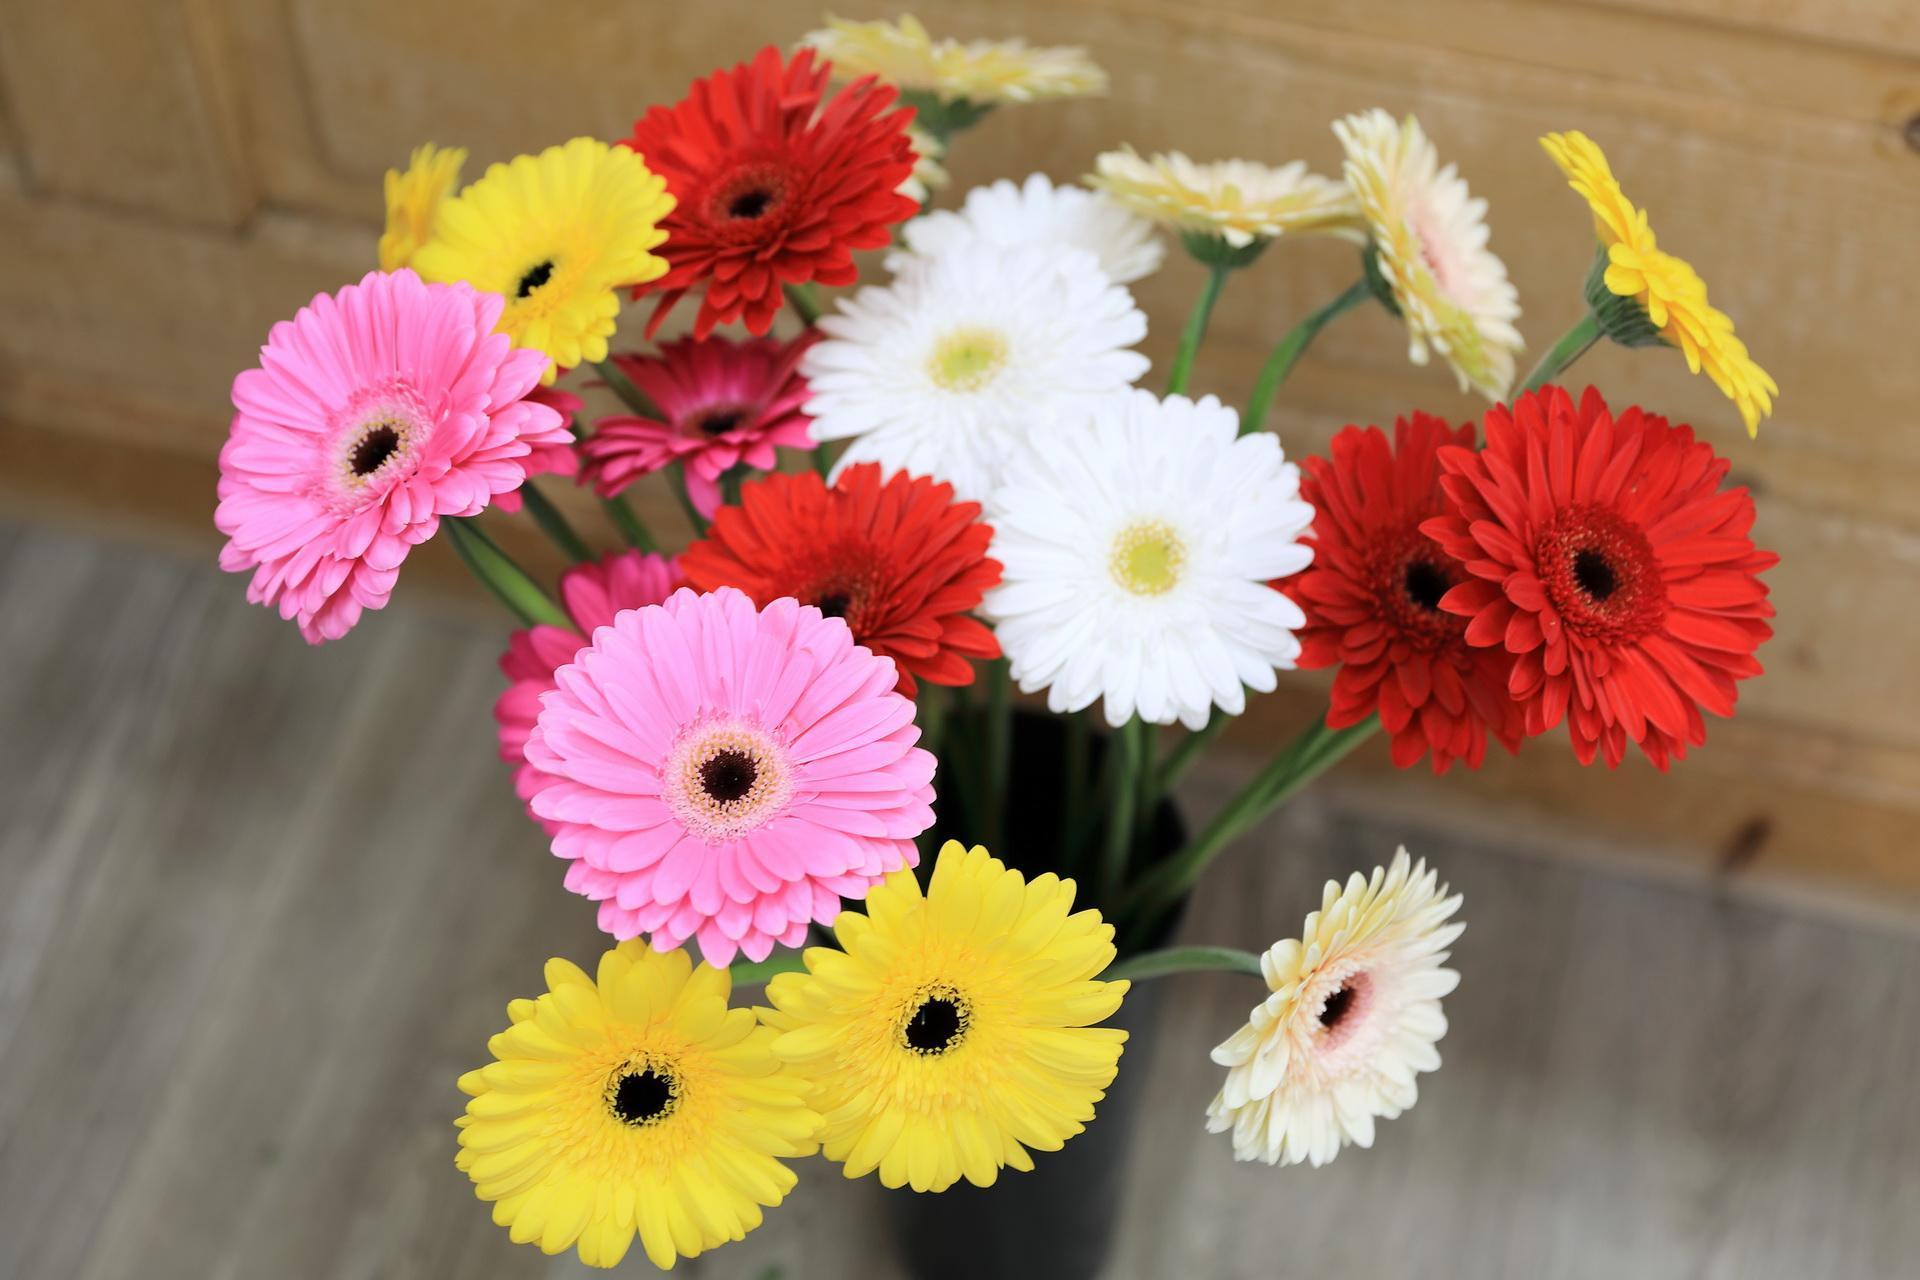 Fleuriste-Leloup-Genval-033.jpg